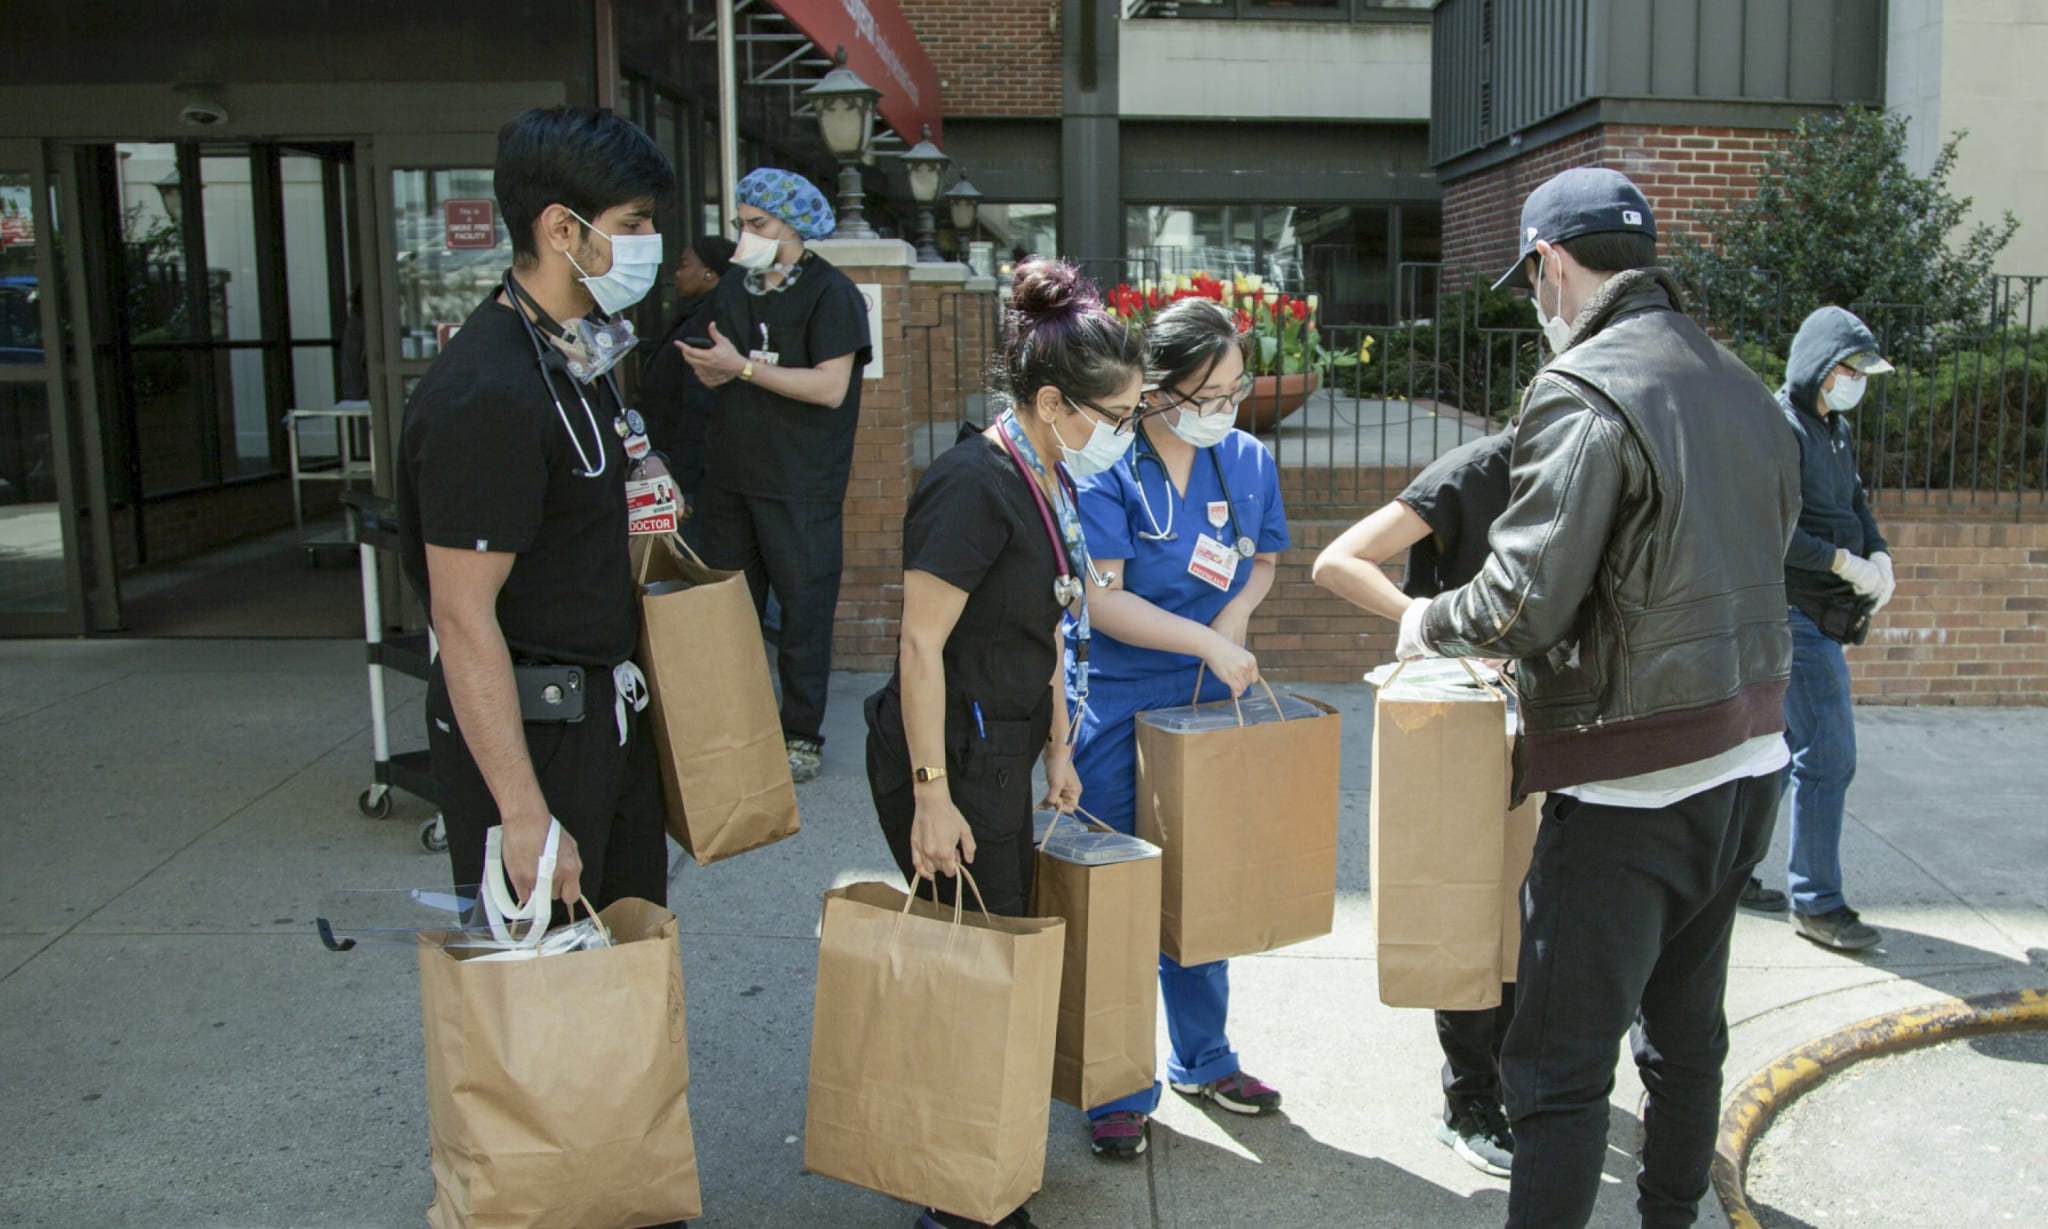 A community helping fight coronavirus.